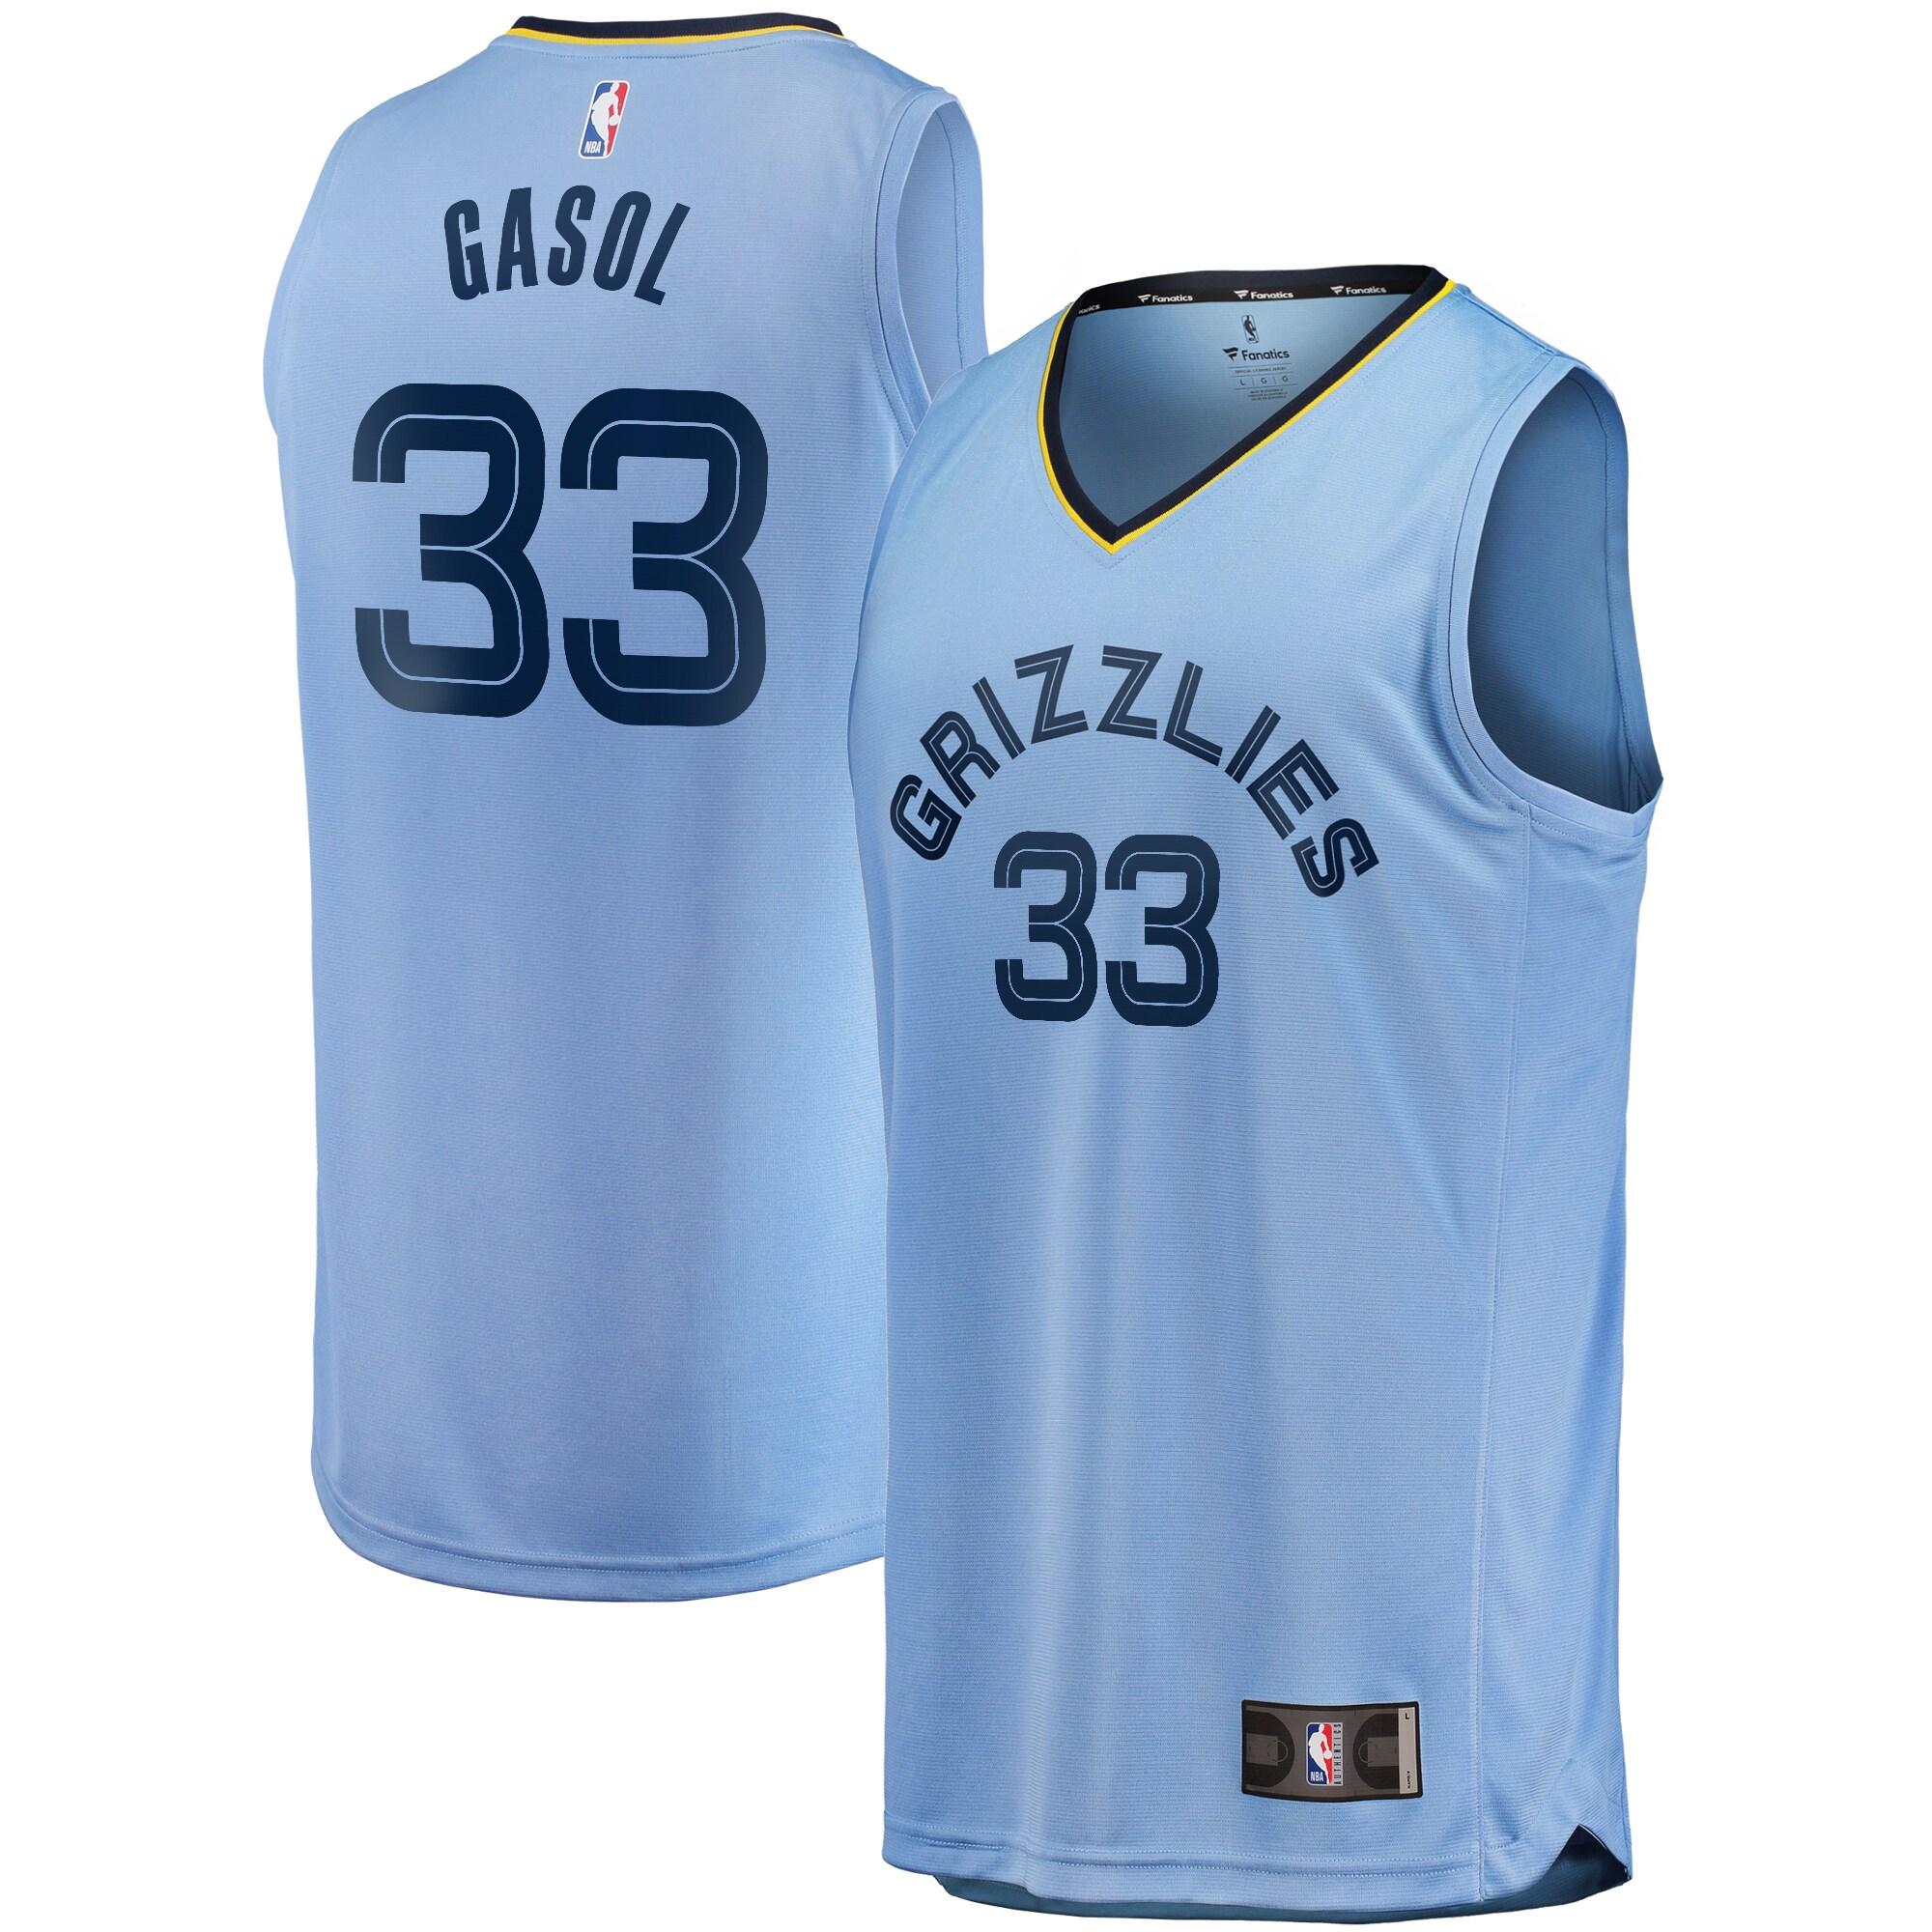 Marc Gasol Memphis Grizzlies Fanatics Branded Youth Draft Fast Break Replica Jersey - Light Blue